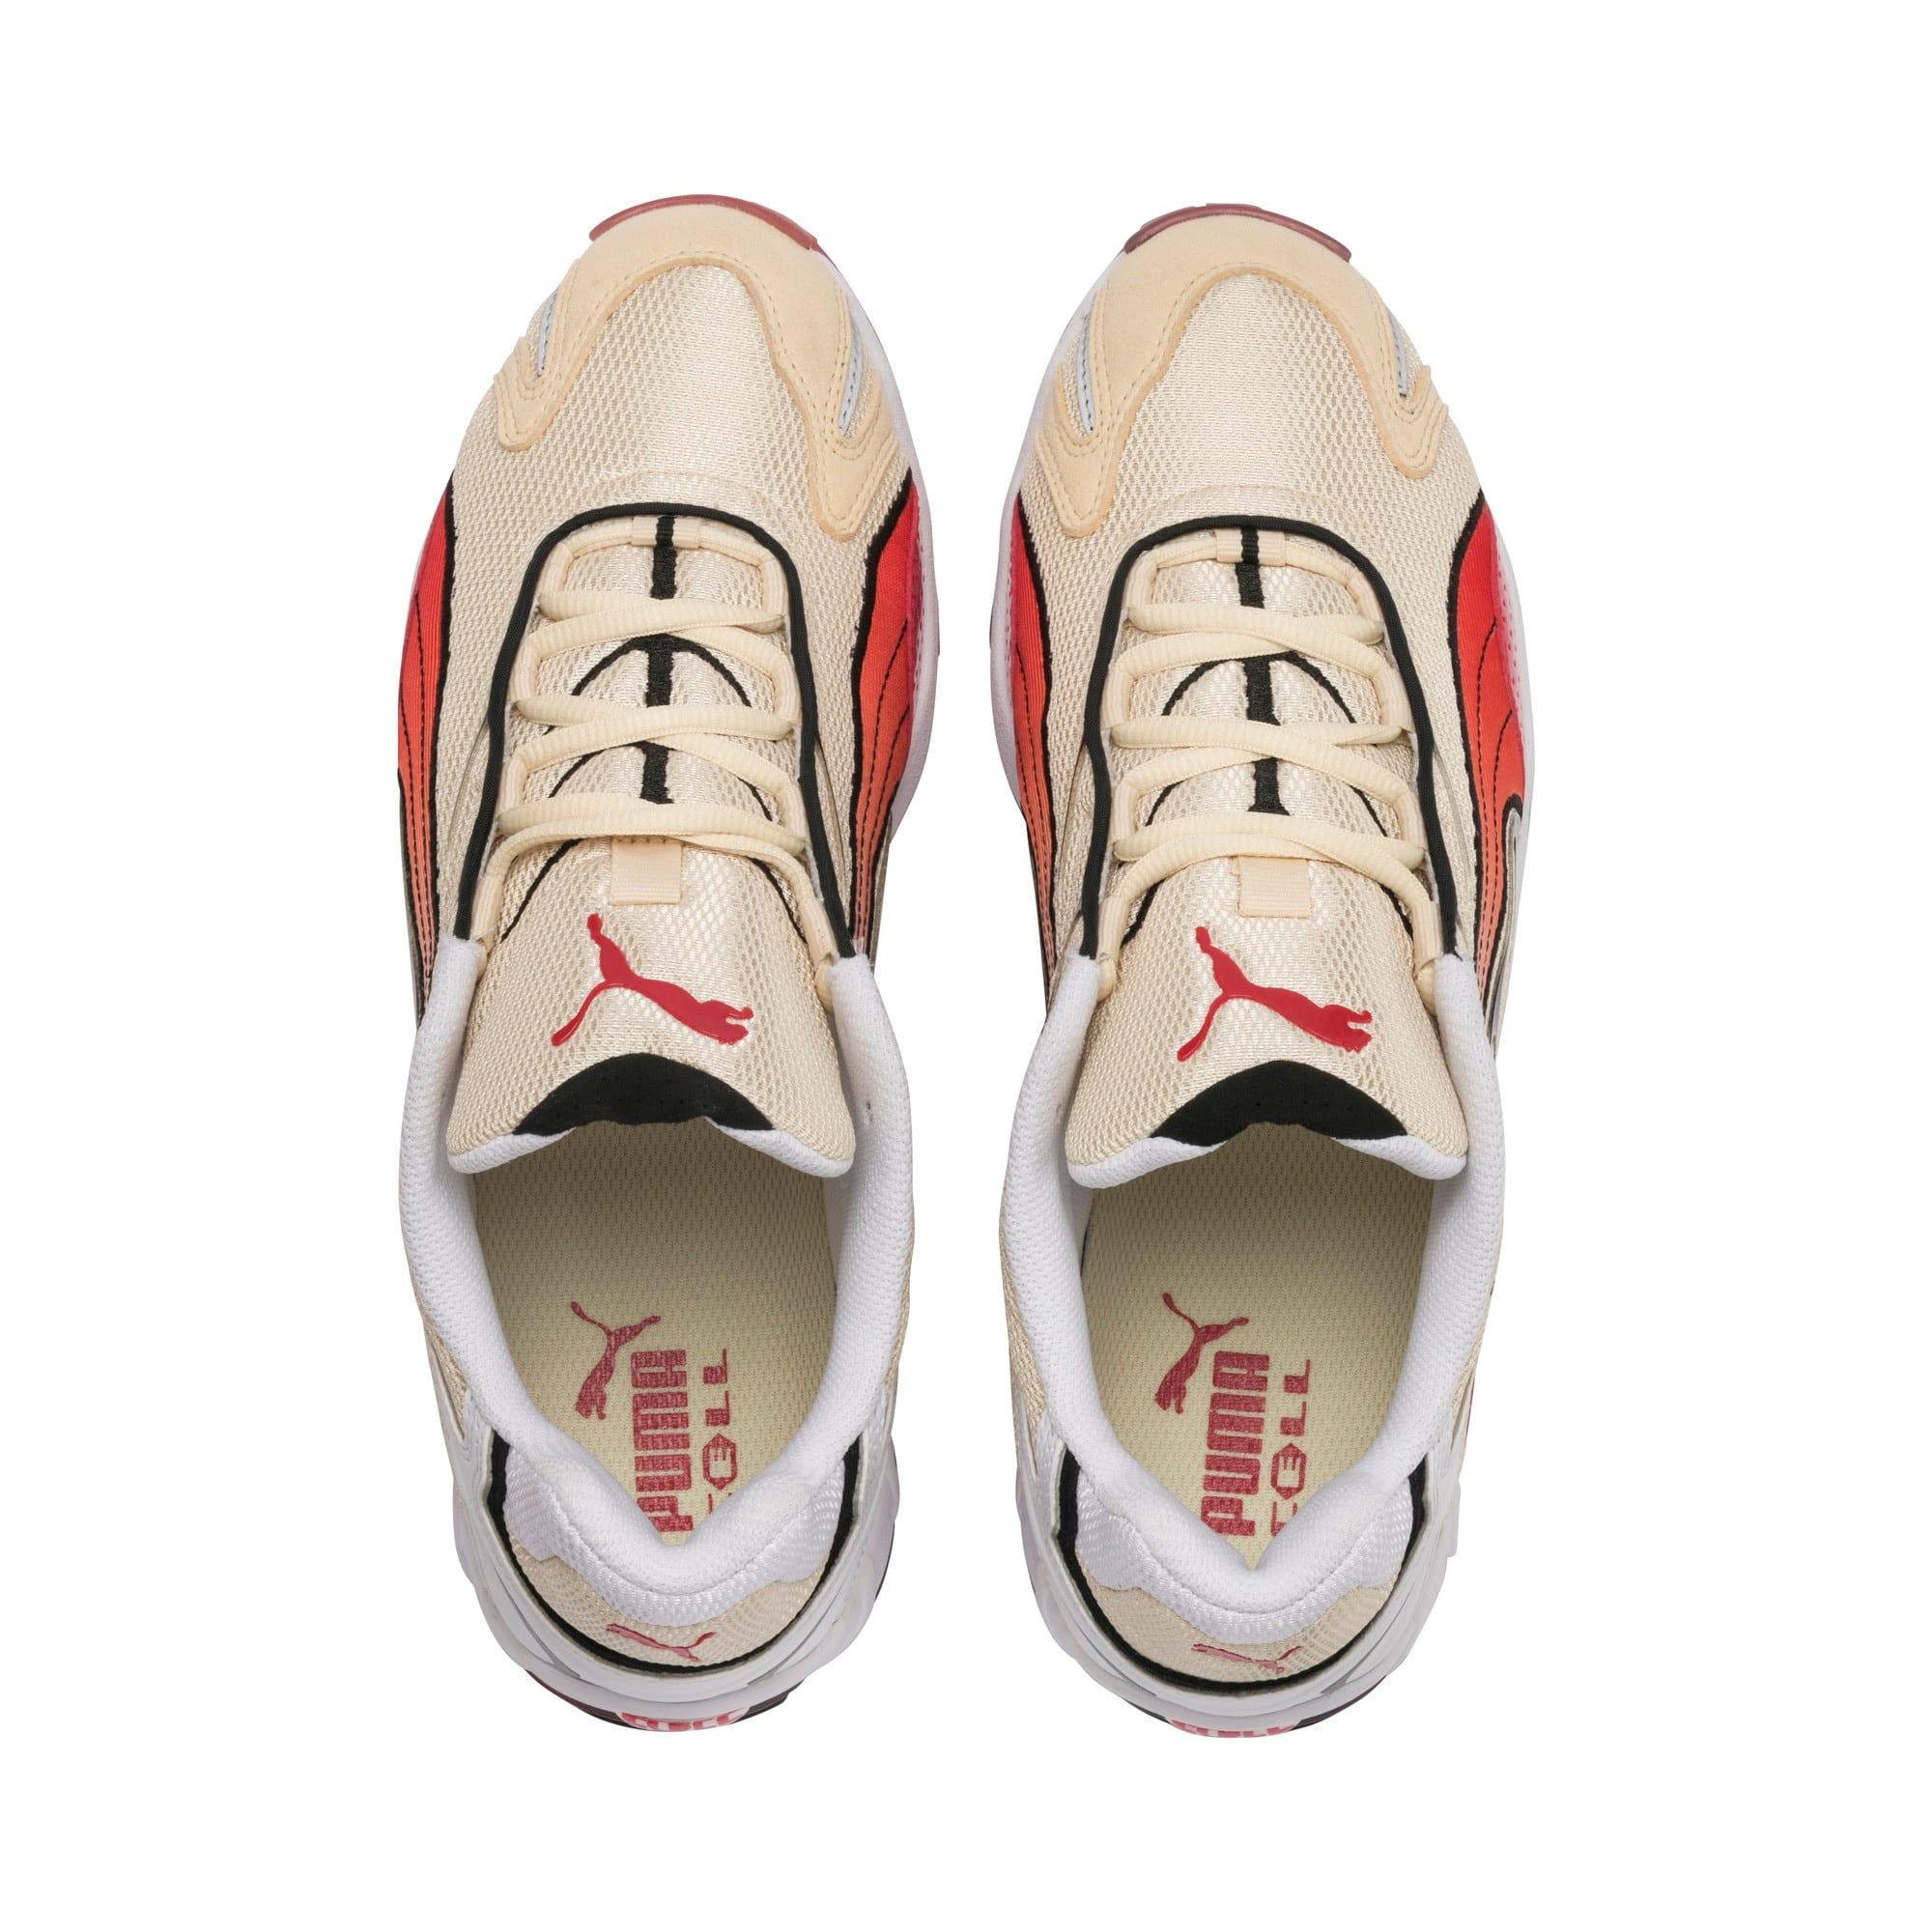 Thumbnail 7 of Inhale Sneakers, Summer Melon-High Risk Red, medium